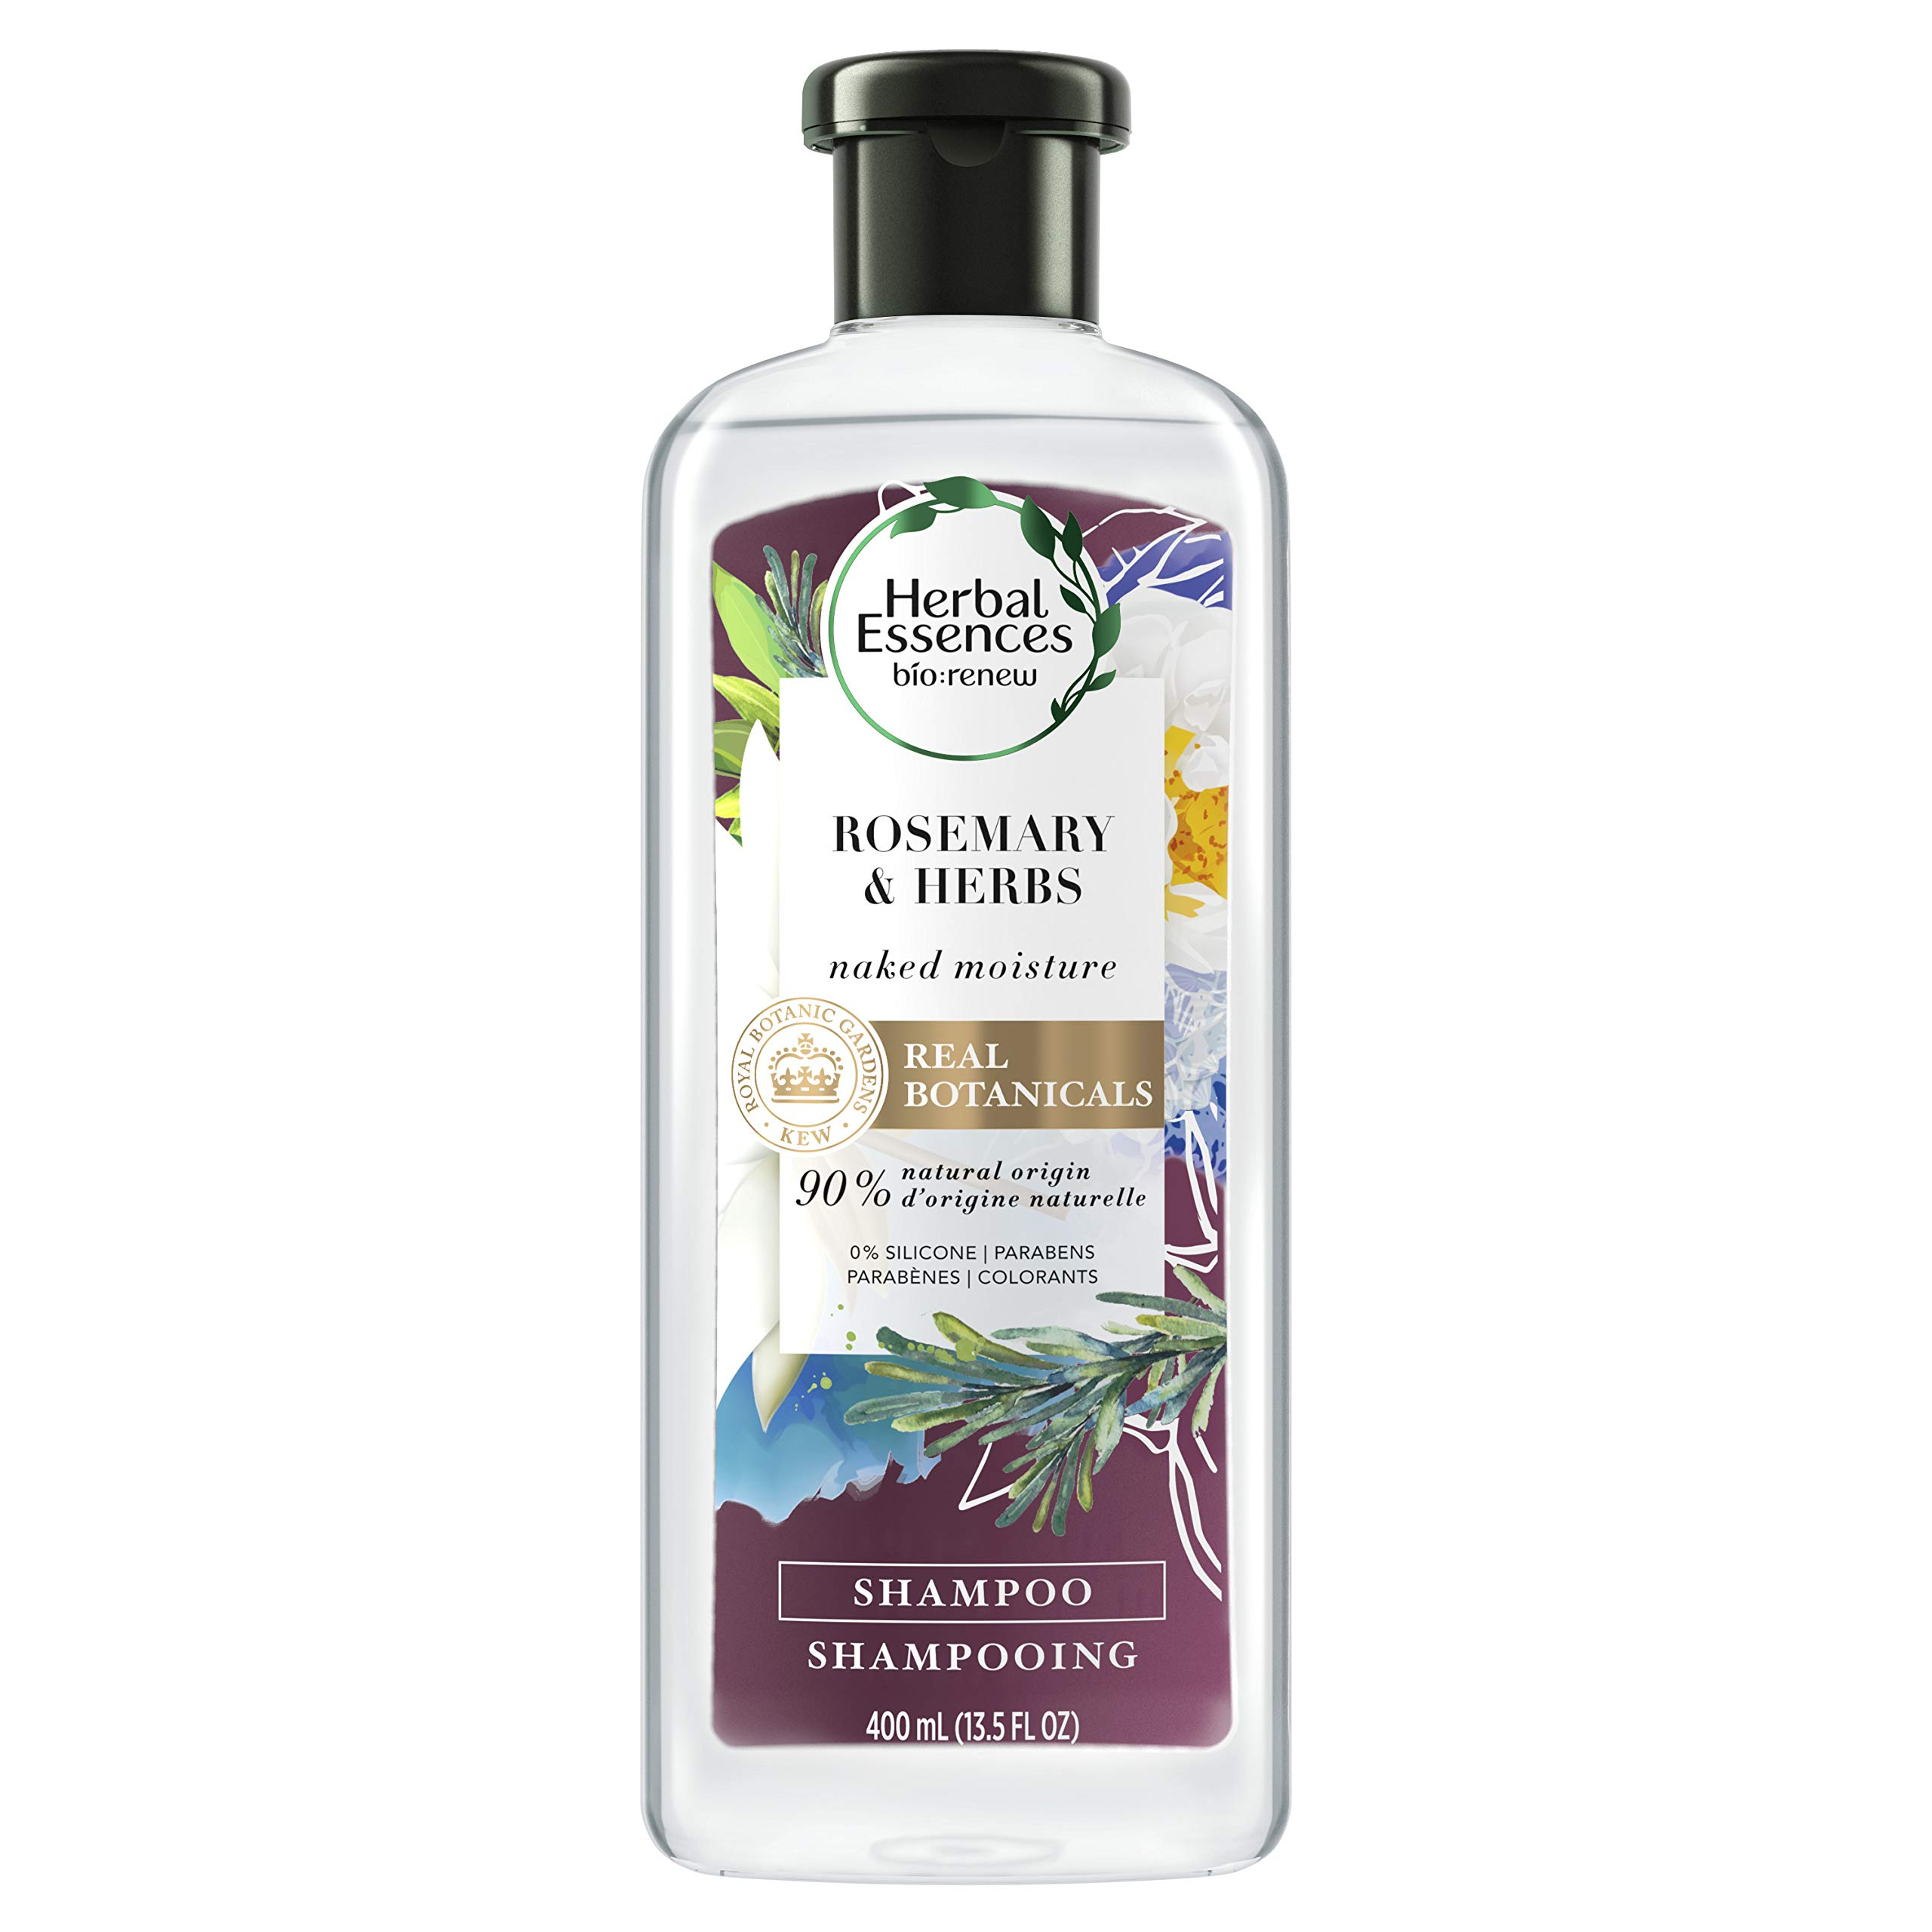 Herbal Essences bio:renew Rosemary & Herbs Shampoo, 13.5 fl oz